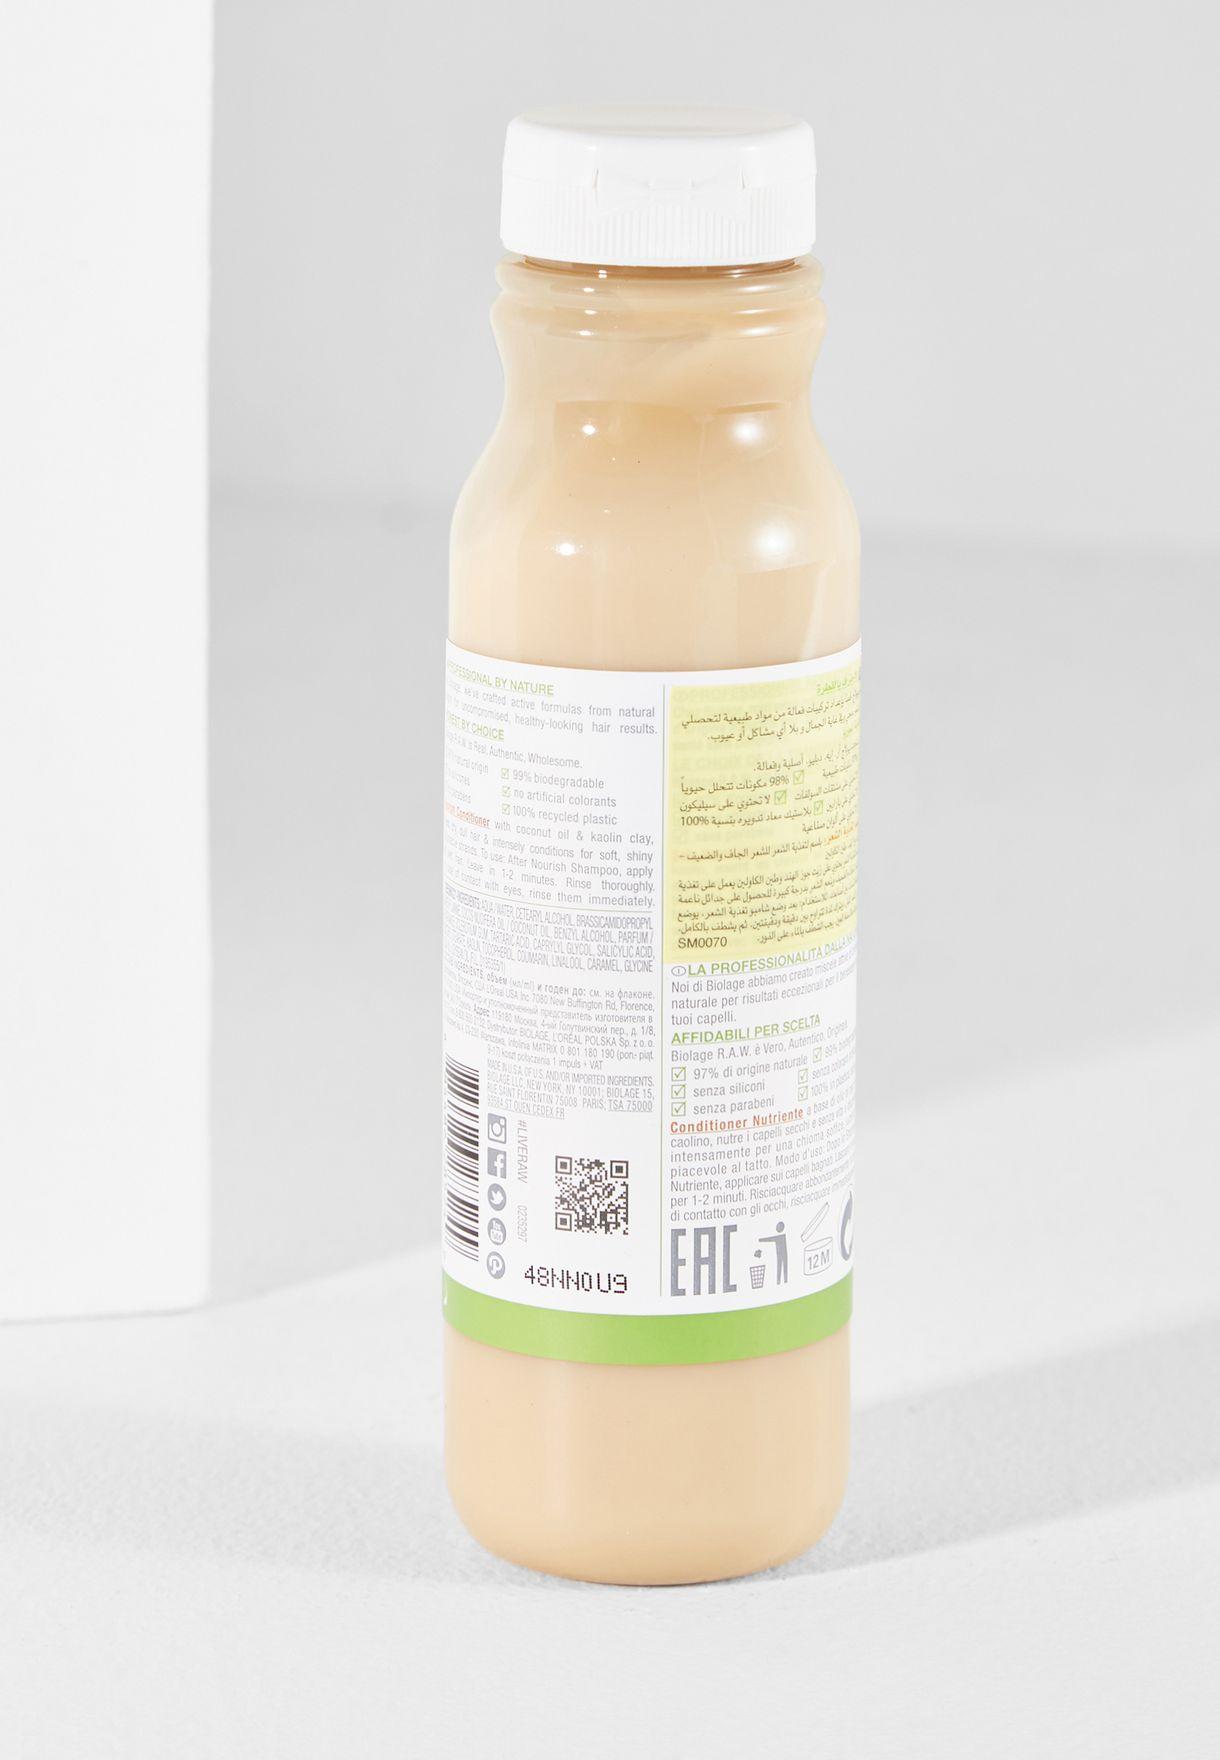 Biolage RAW Nourishing Conditioner 325ml